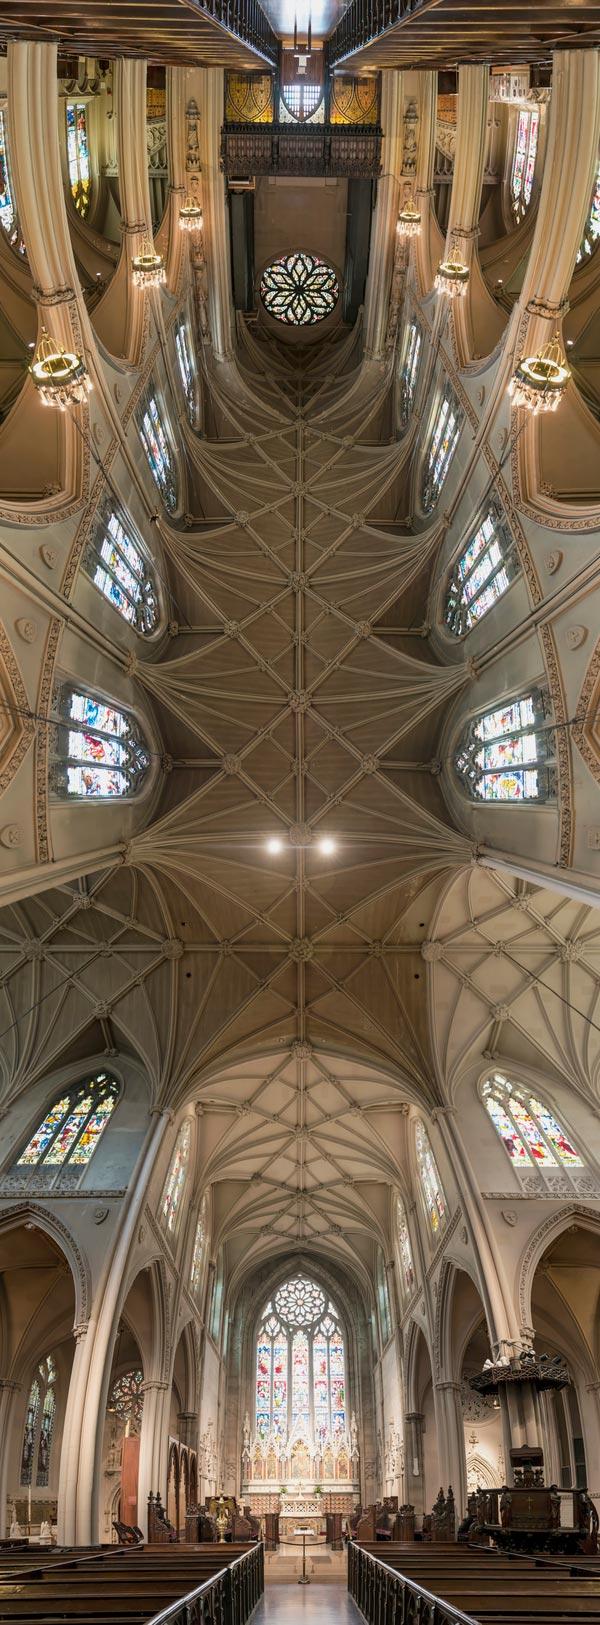 vertical panoramas of church ceilings 2 Amazing Vertical Panoramas of Church Ceilings